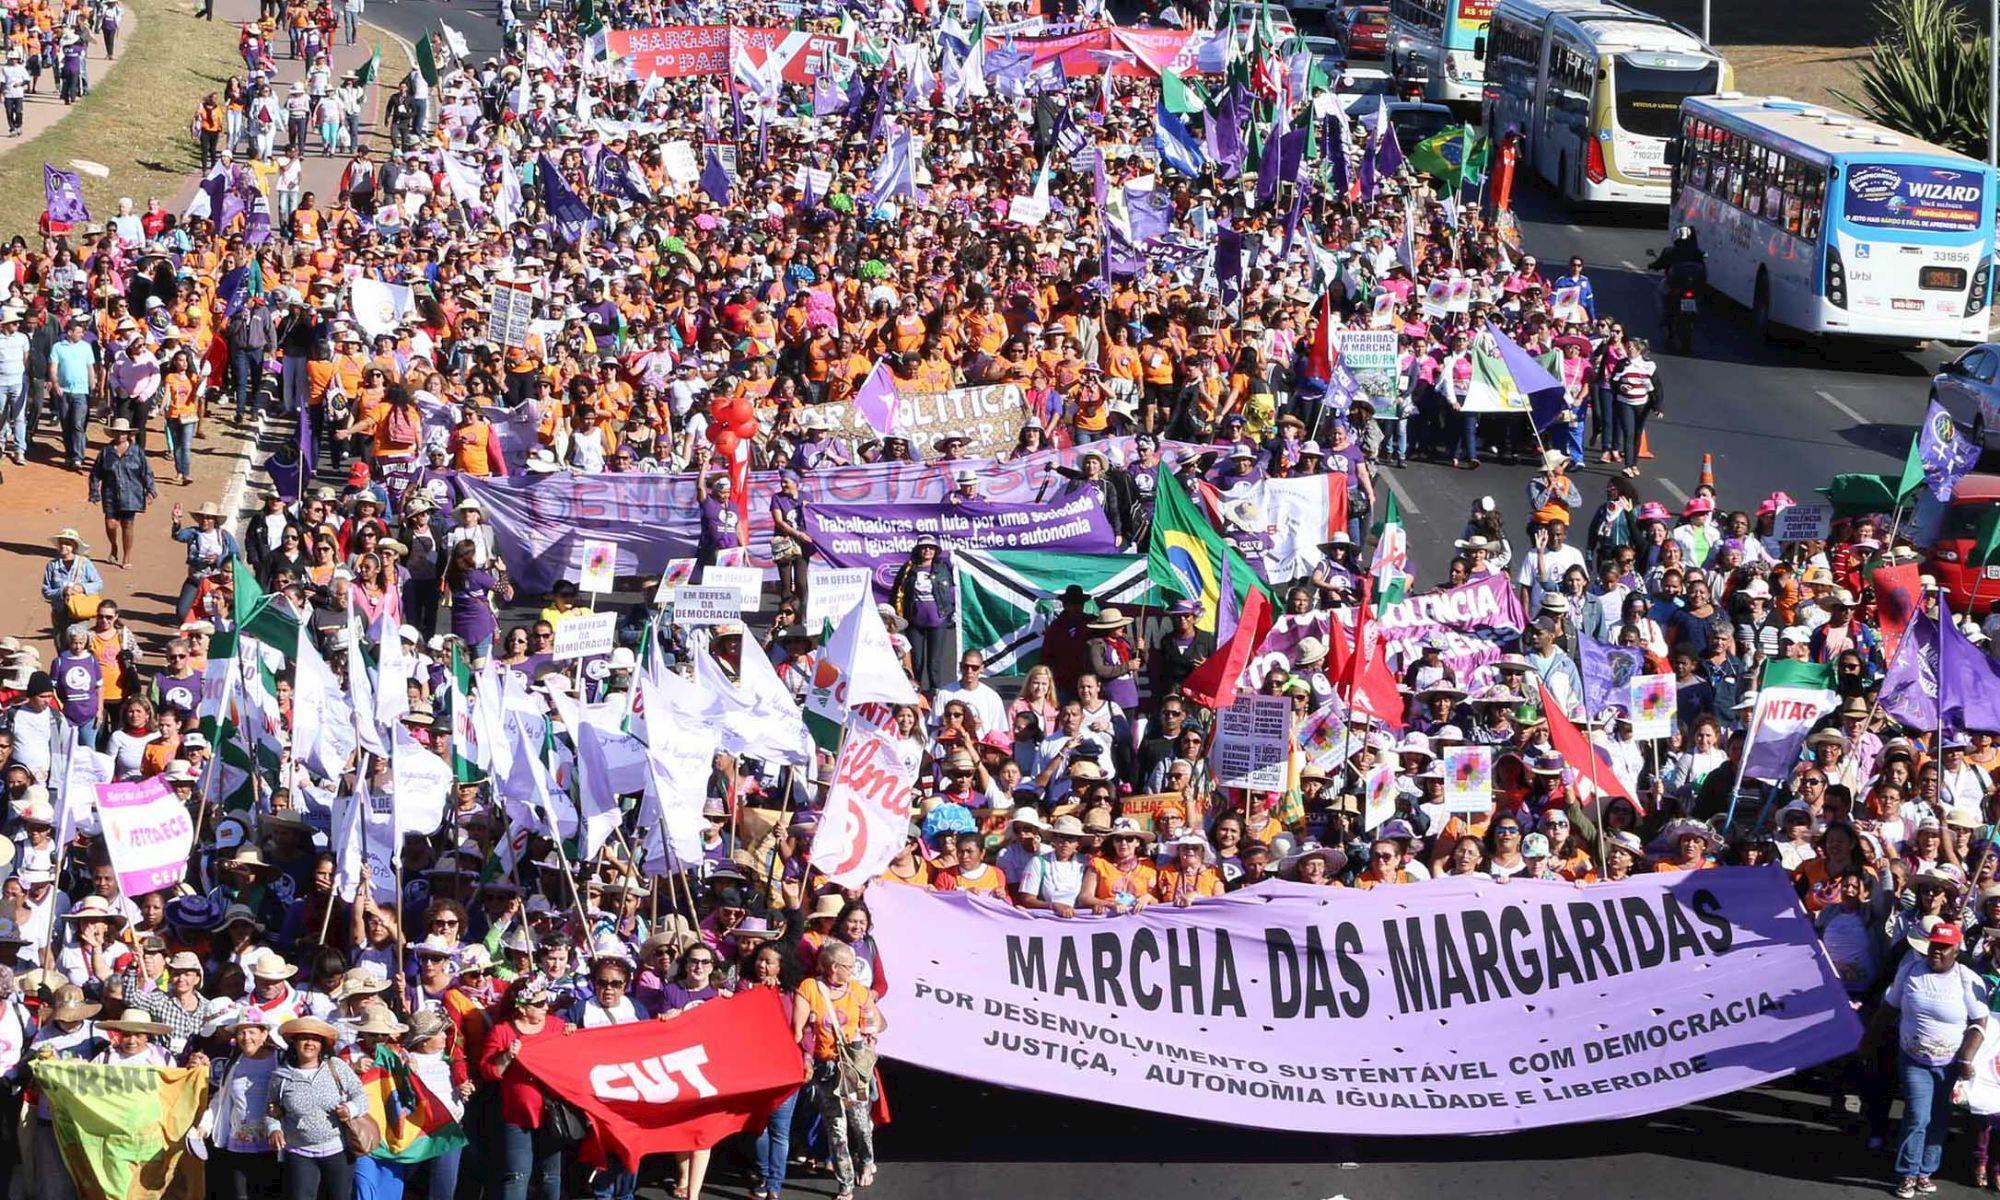 marcha, margaridas, brasilia, mulher, feminismo,, Lula Marques